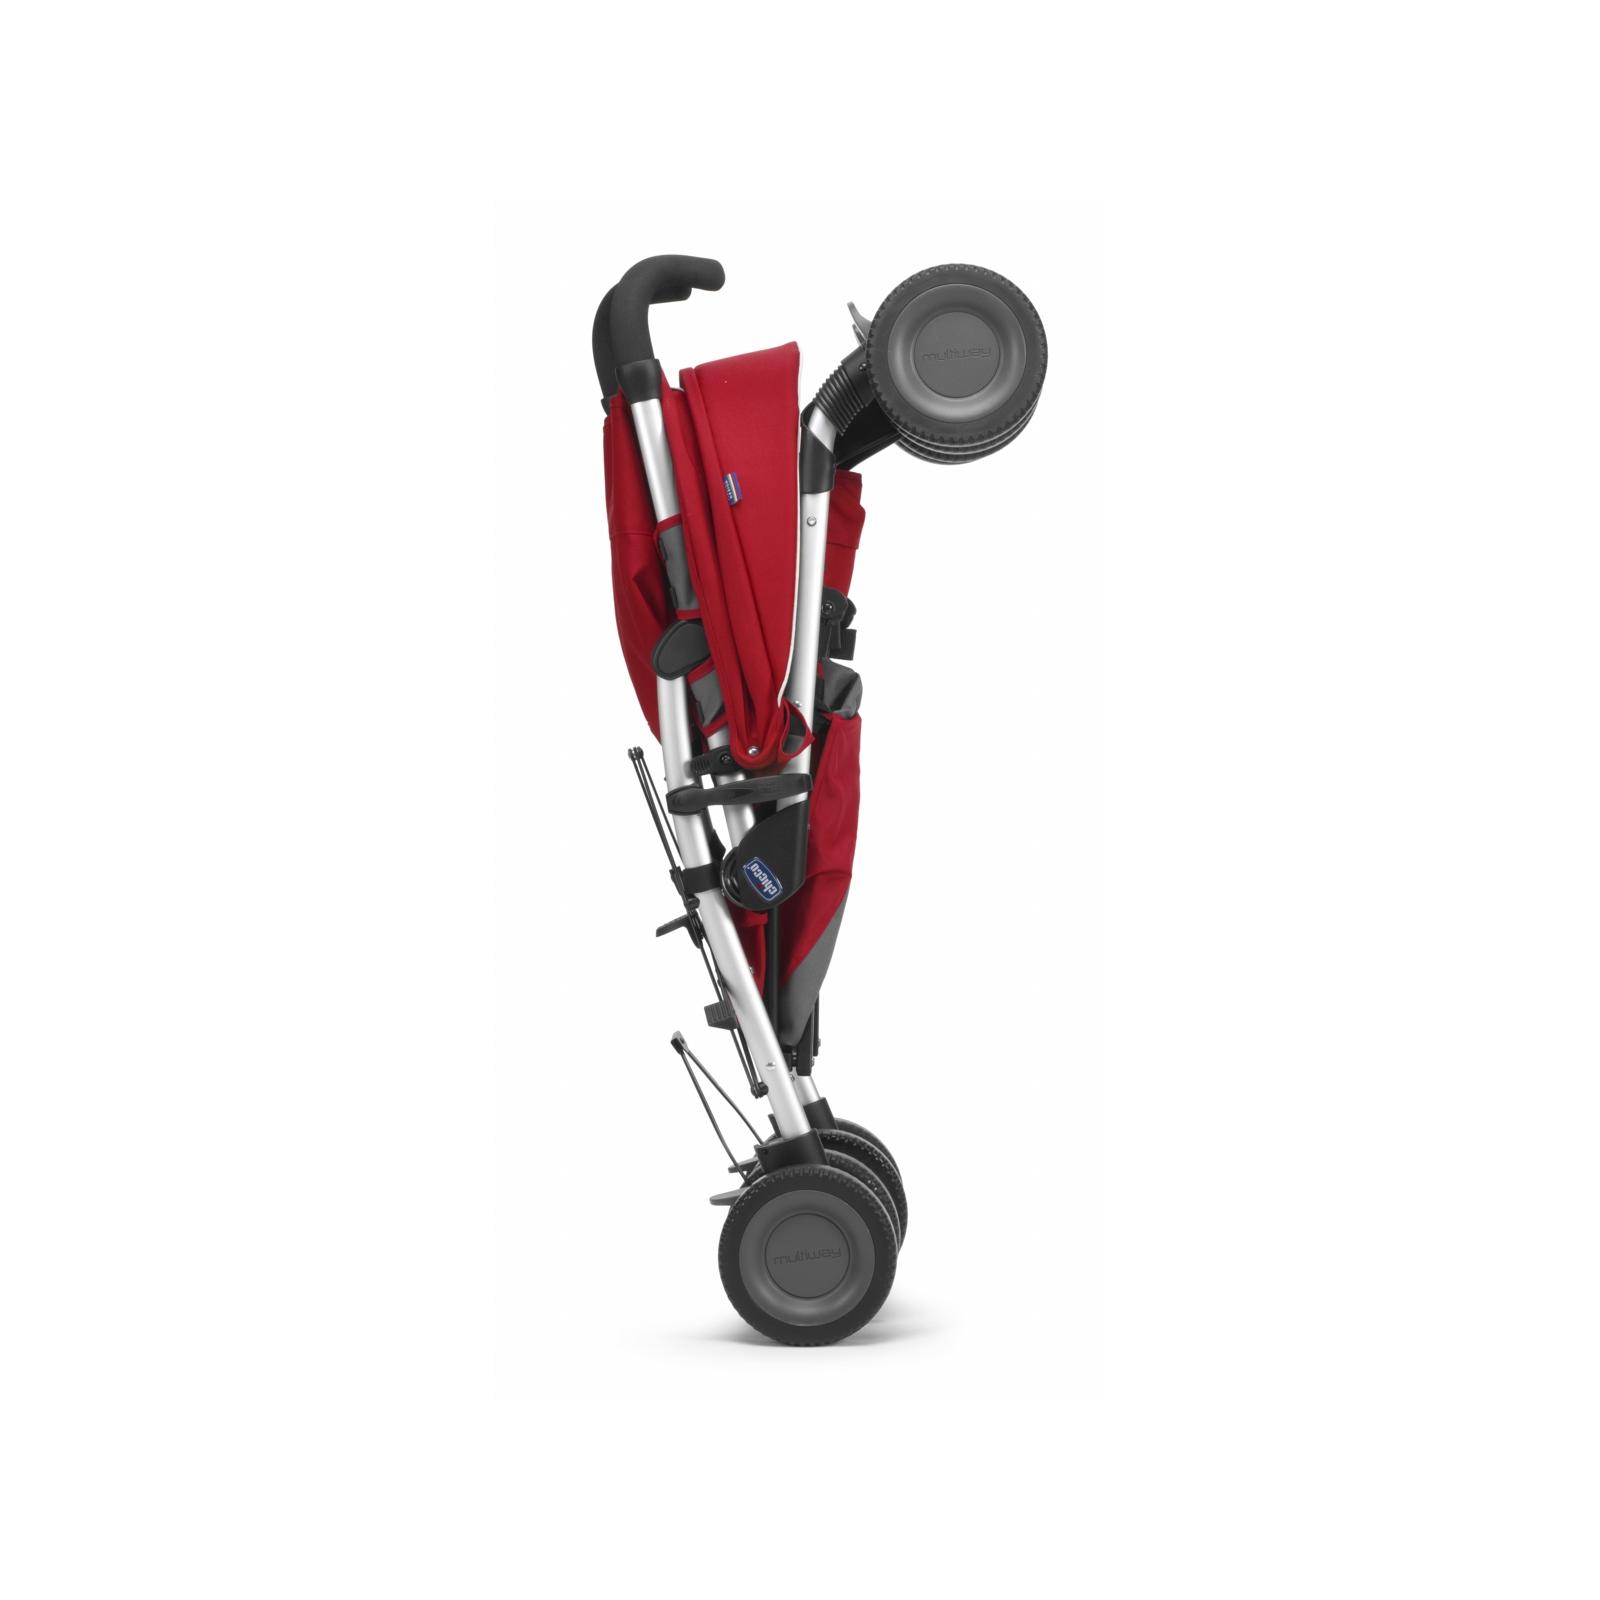 Коляска Chicco Multiway Evo Stroller Red (79315.70) изображение 8